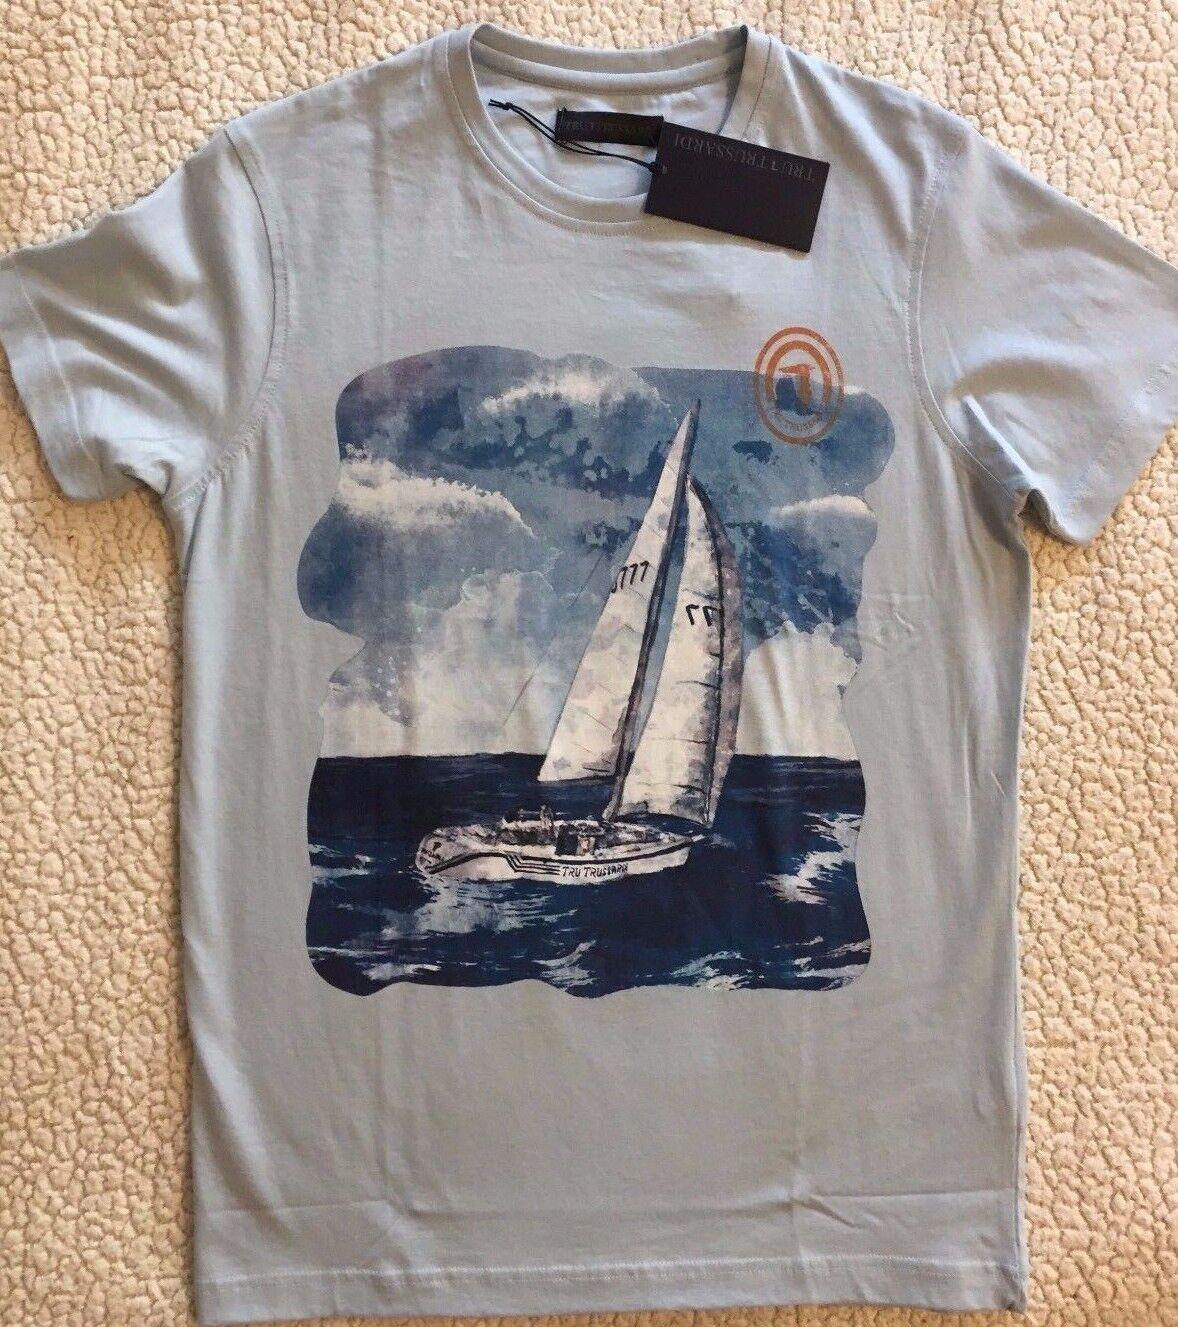 Trussardi  T-shirt Brand New Collection 2018